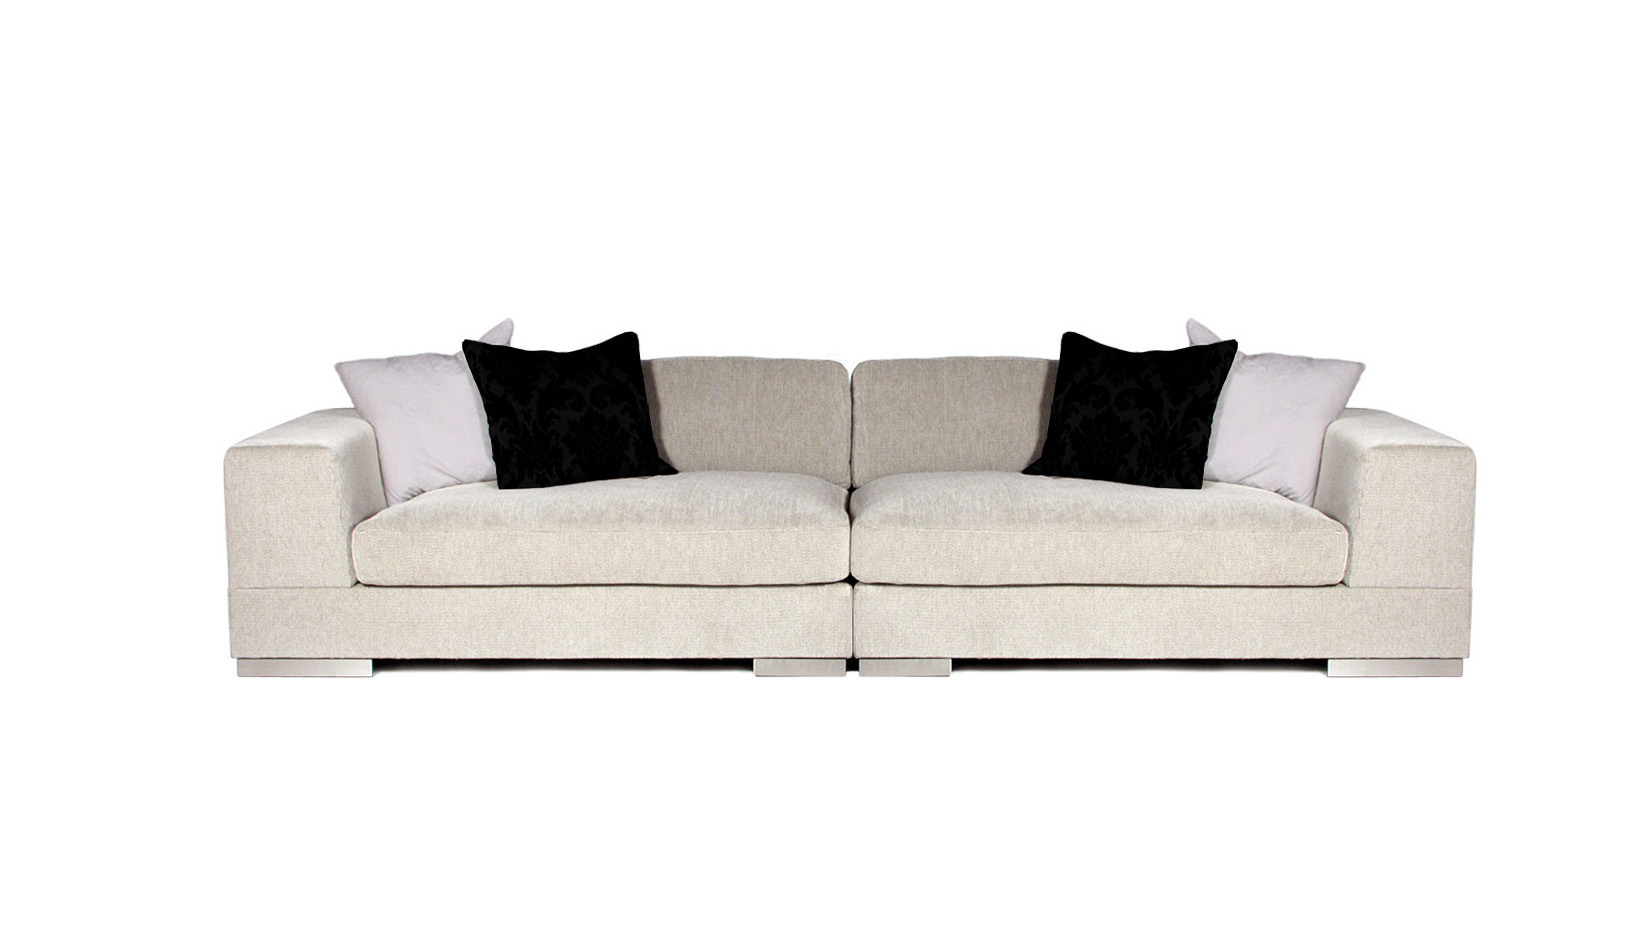 Sofa-Lazy-kremine-priekis